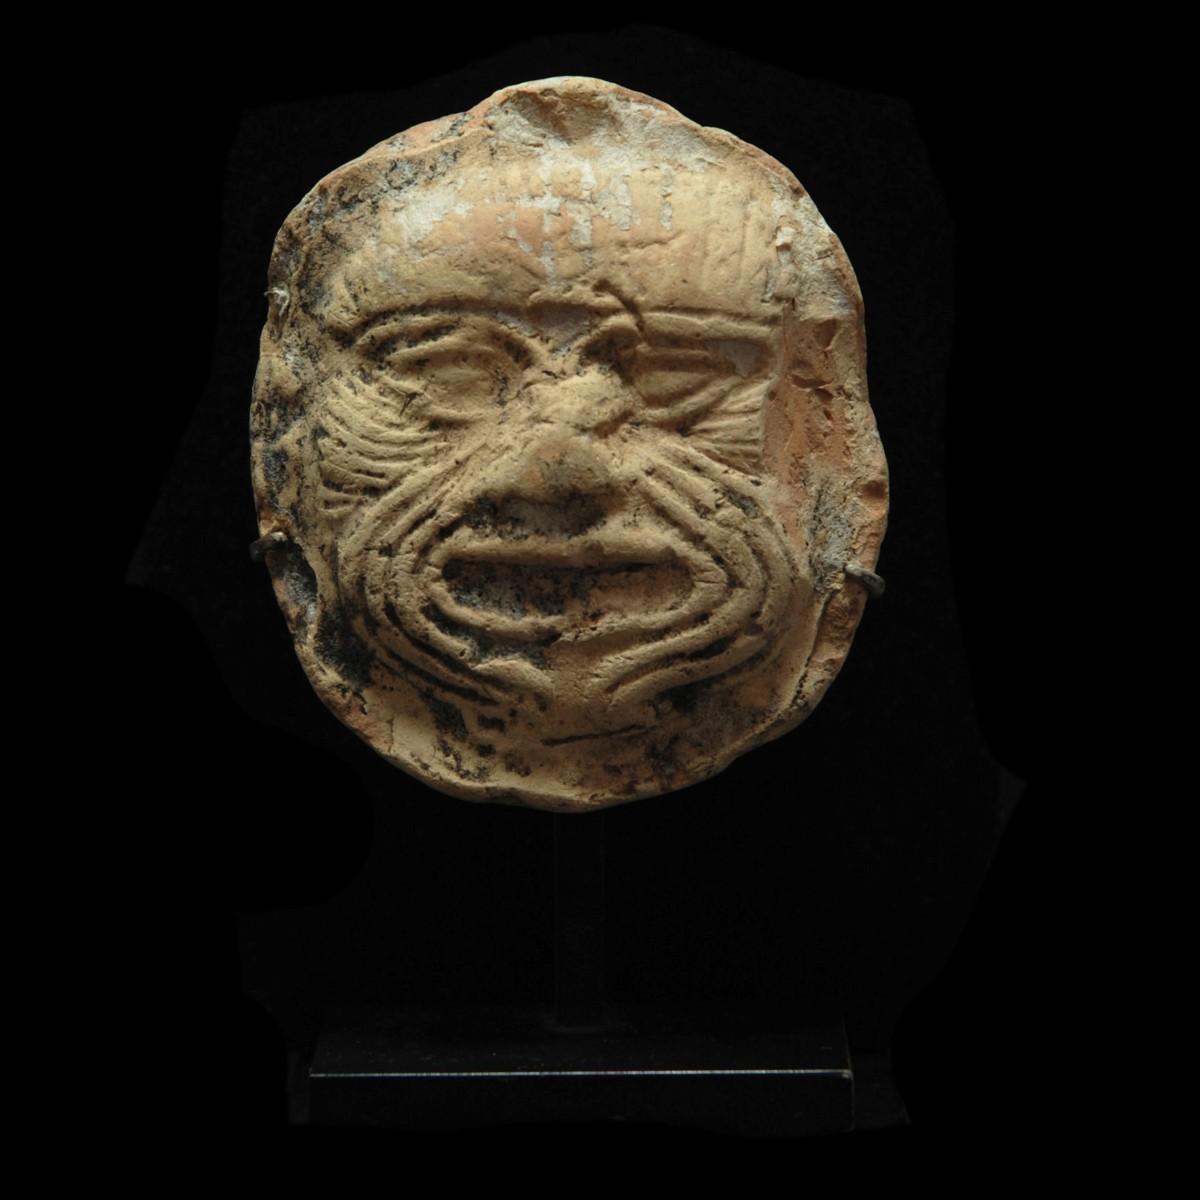 Terracotta plaque of Humbaba